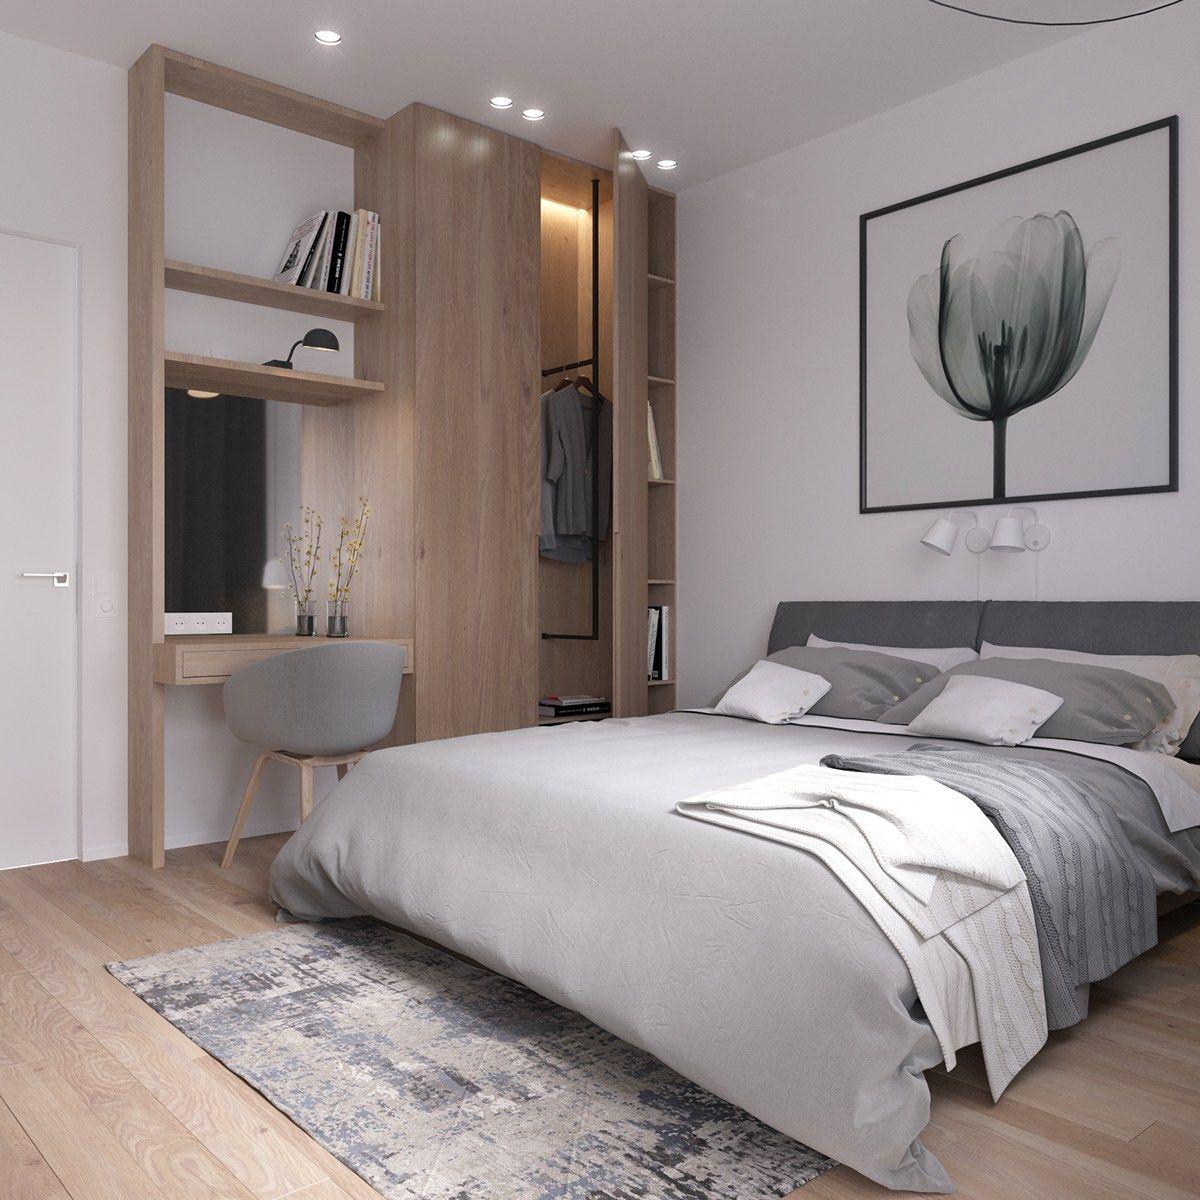 A Sleek And Surprising Interior Inspired By Scandinavian Modernism Minimalist Bedroom Design Scandinavian Bedroom Decor Scandinavian Design Bedroom Interior bedroom best home design